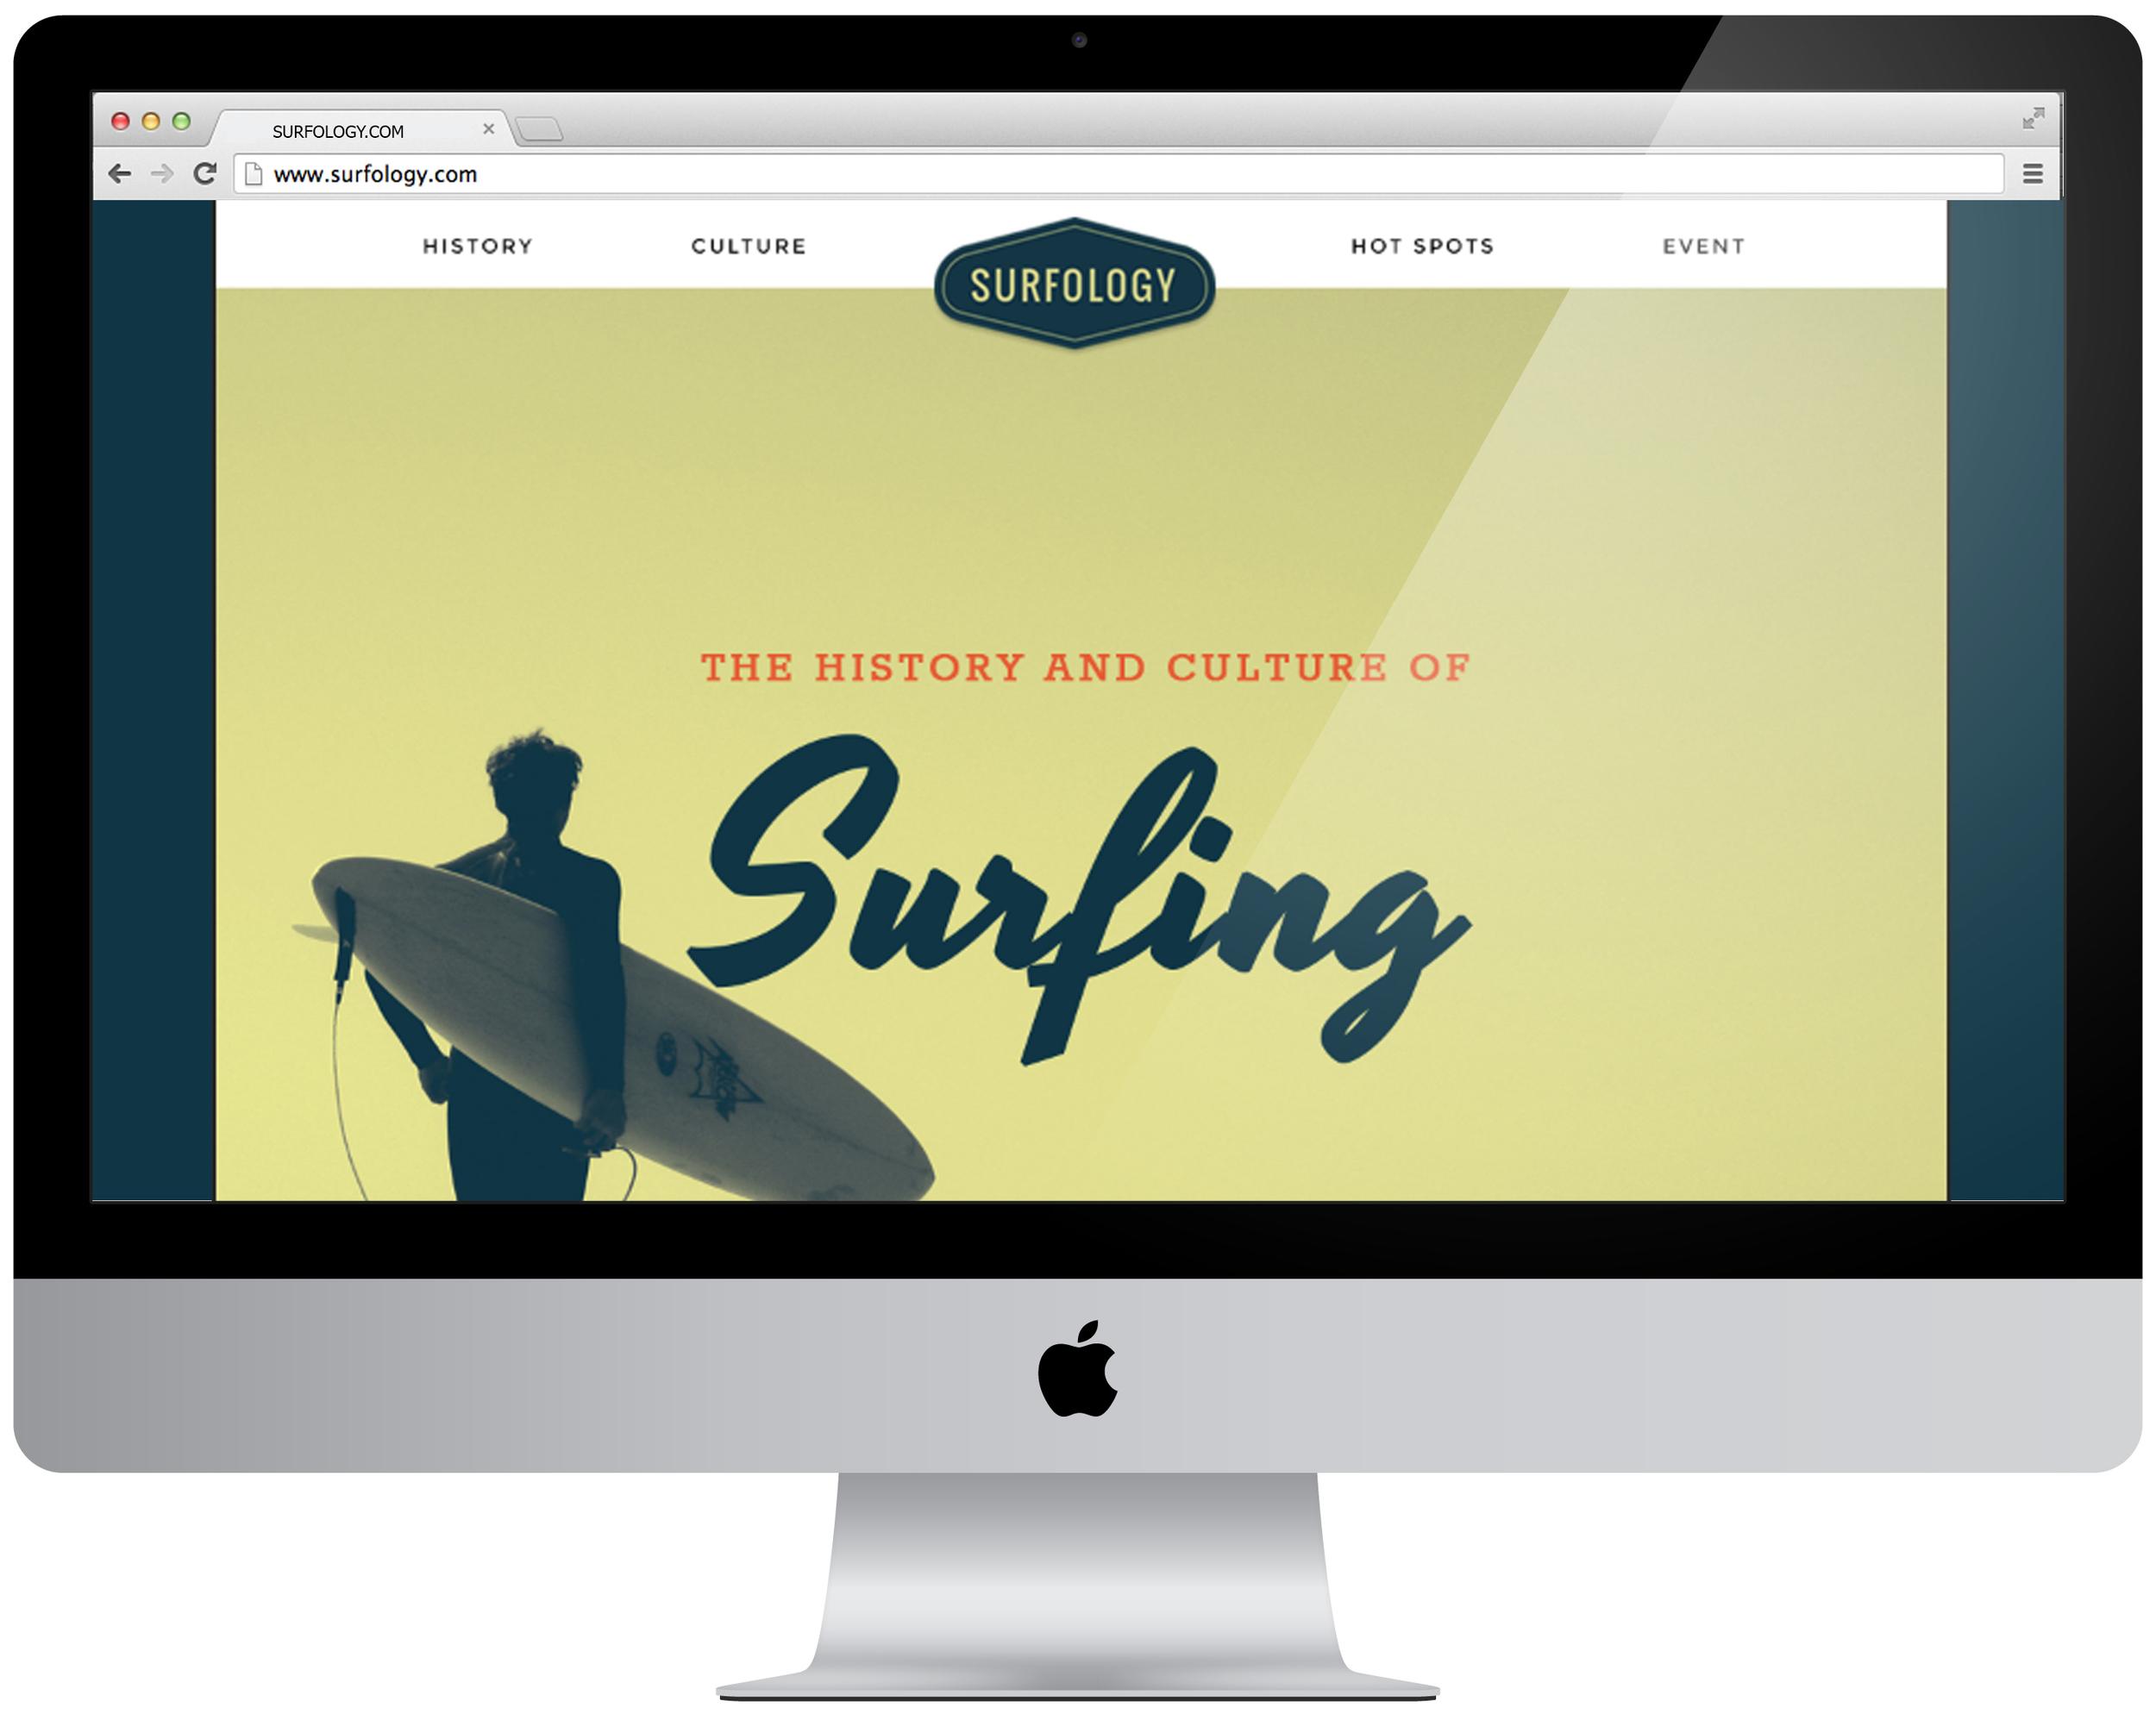 surfology1.jpg